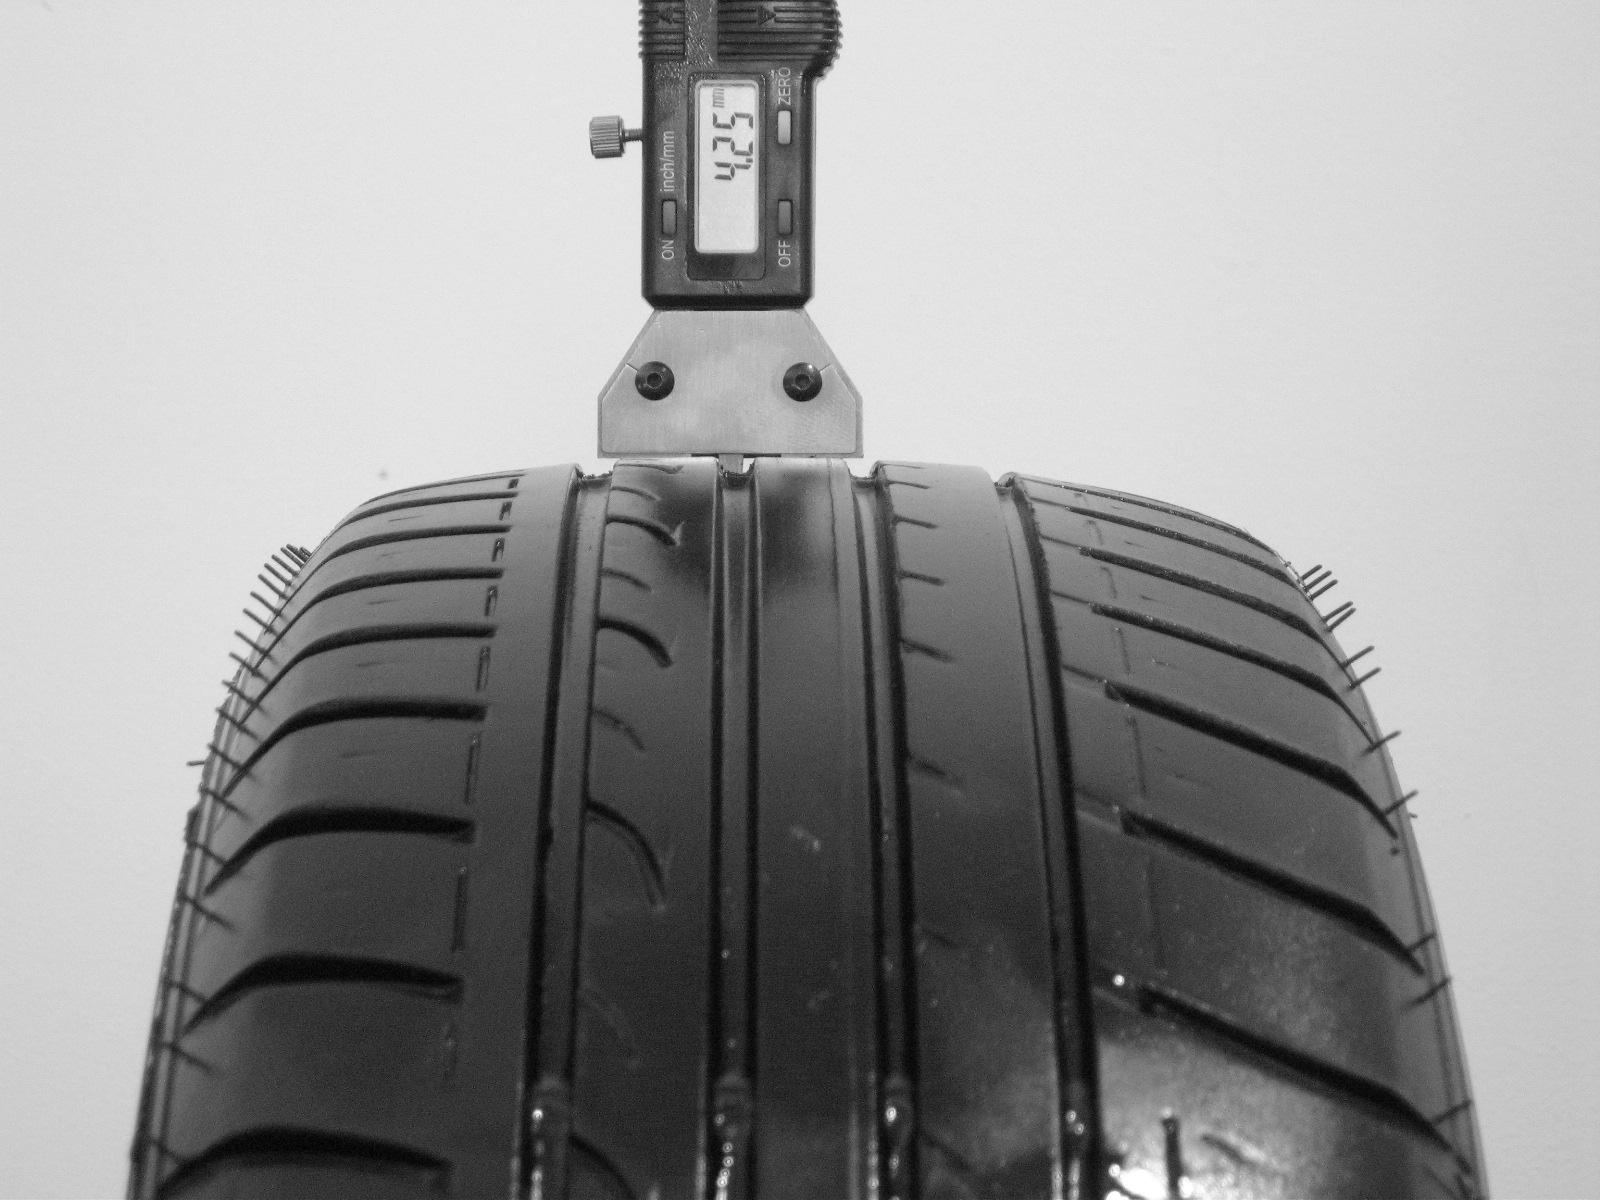 Použité-Pneu-Bazar - 185/65 R15 DUNLOP SP SPORT FASTRESPONSE -kusovka-rezerva 3mm